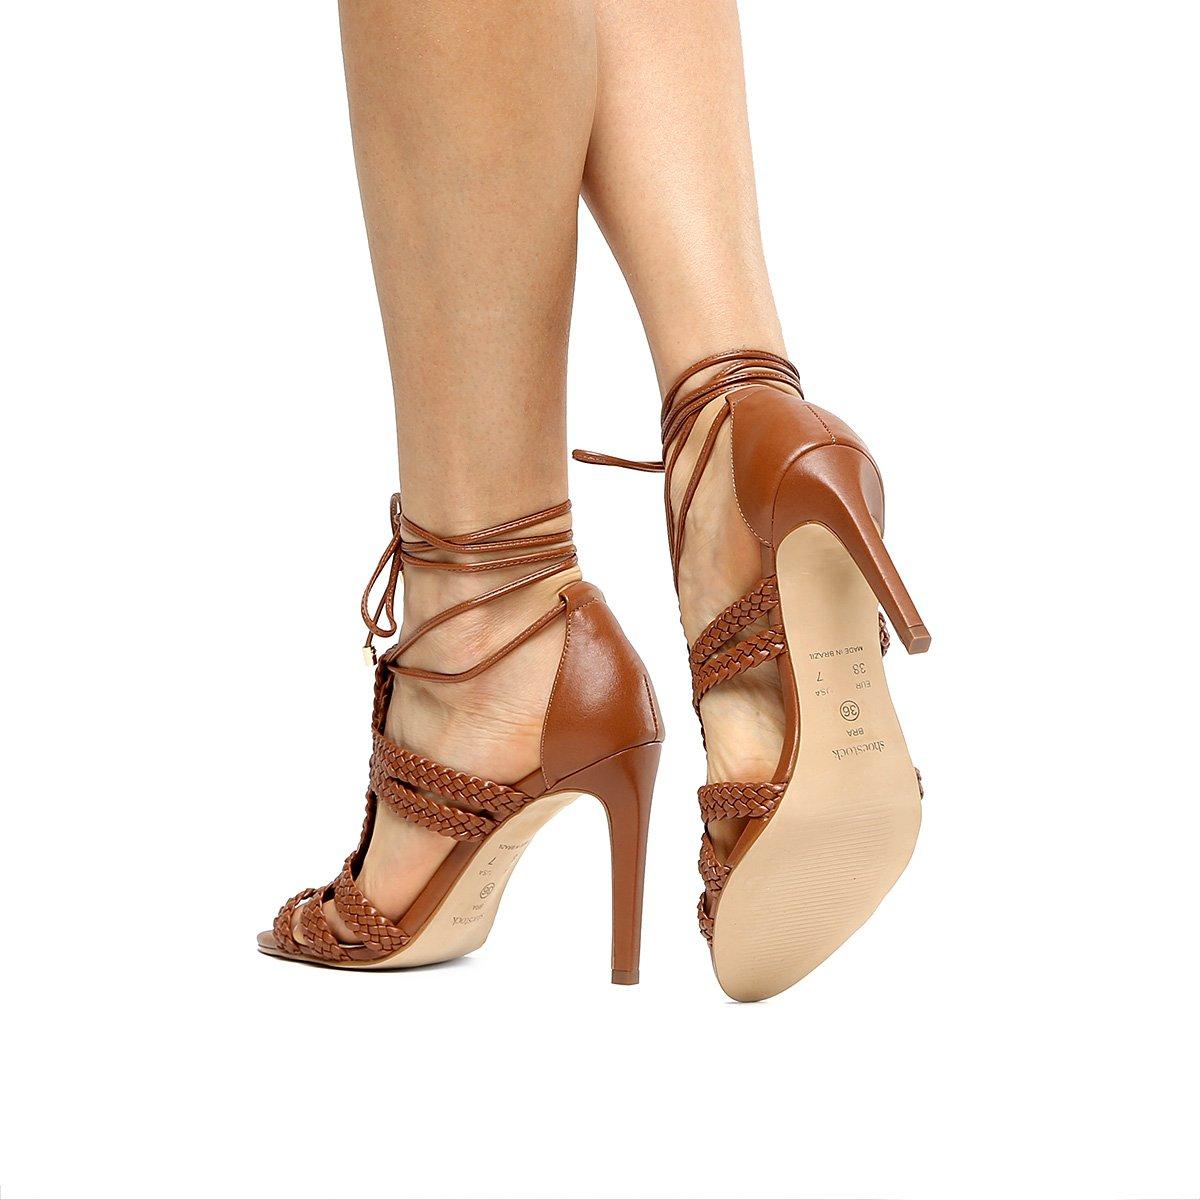 f1dcbf7758fd2 ... Macramê Sandália Feminina Sandália Salto Alto Shoestock Caramelo  Shoestock fw5qX8 ...